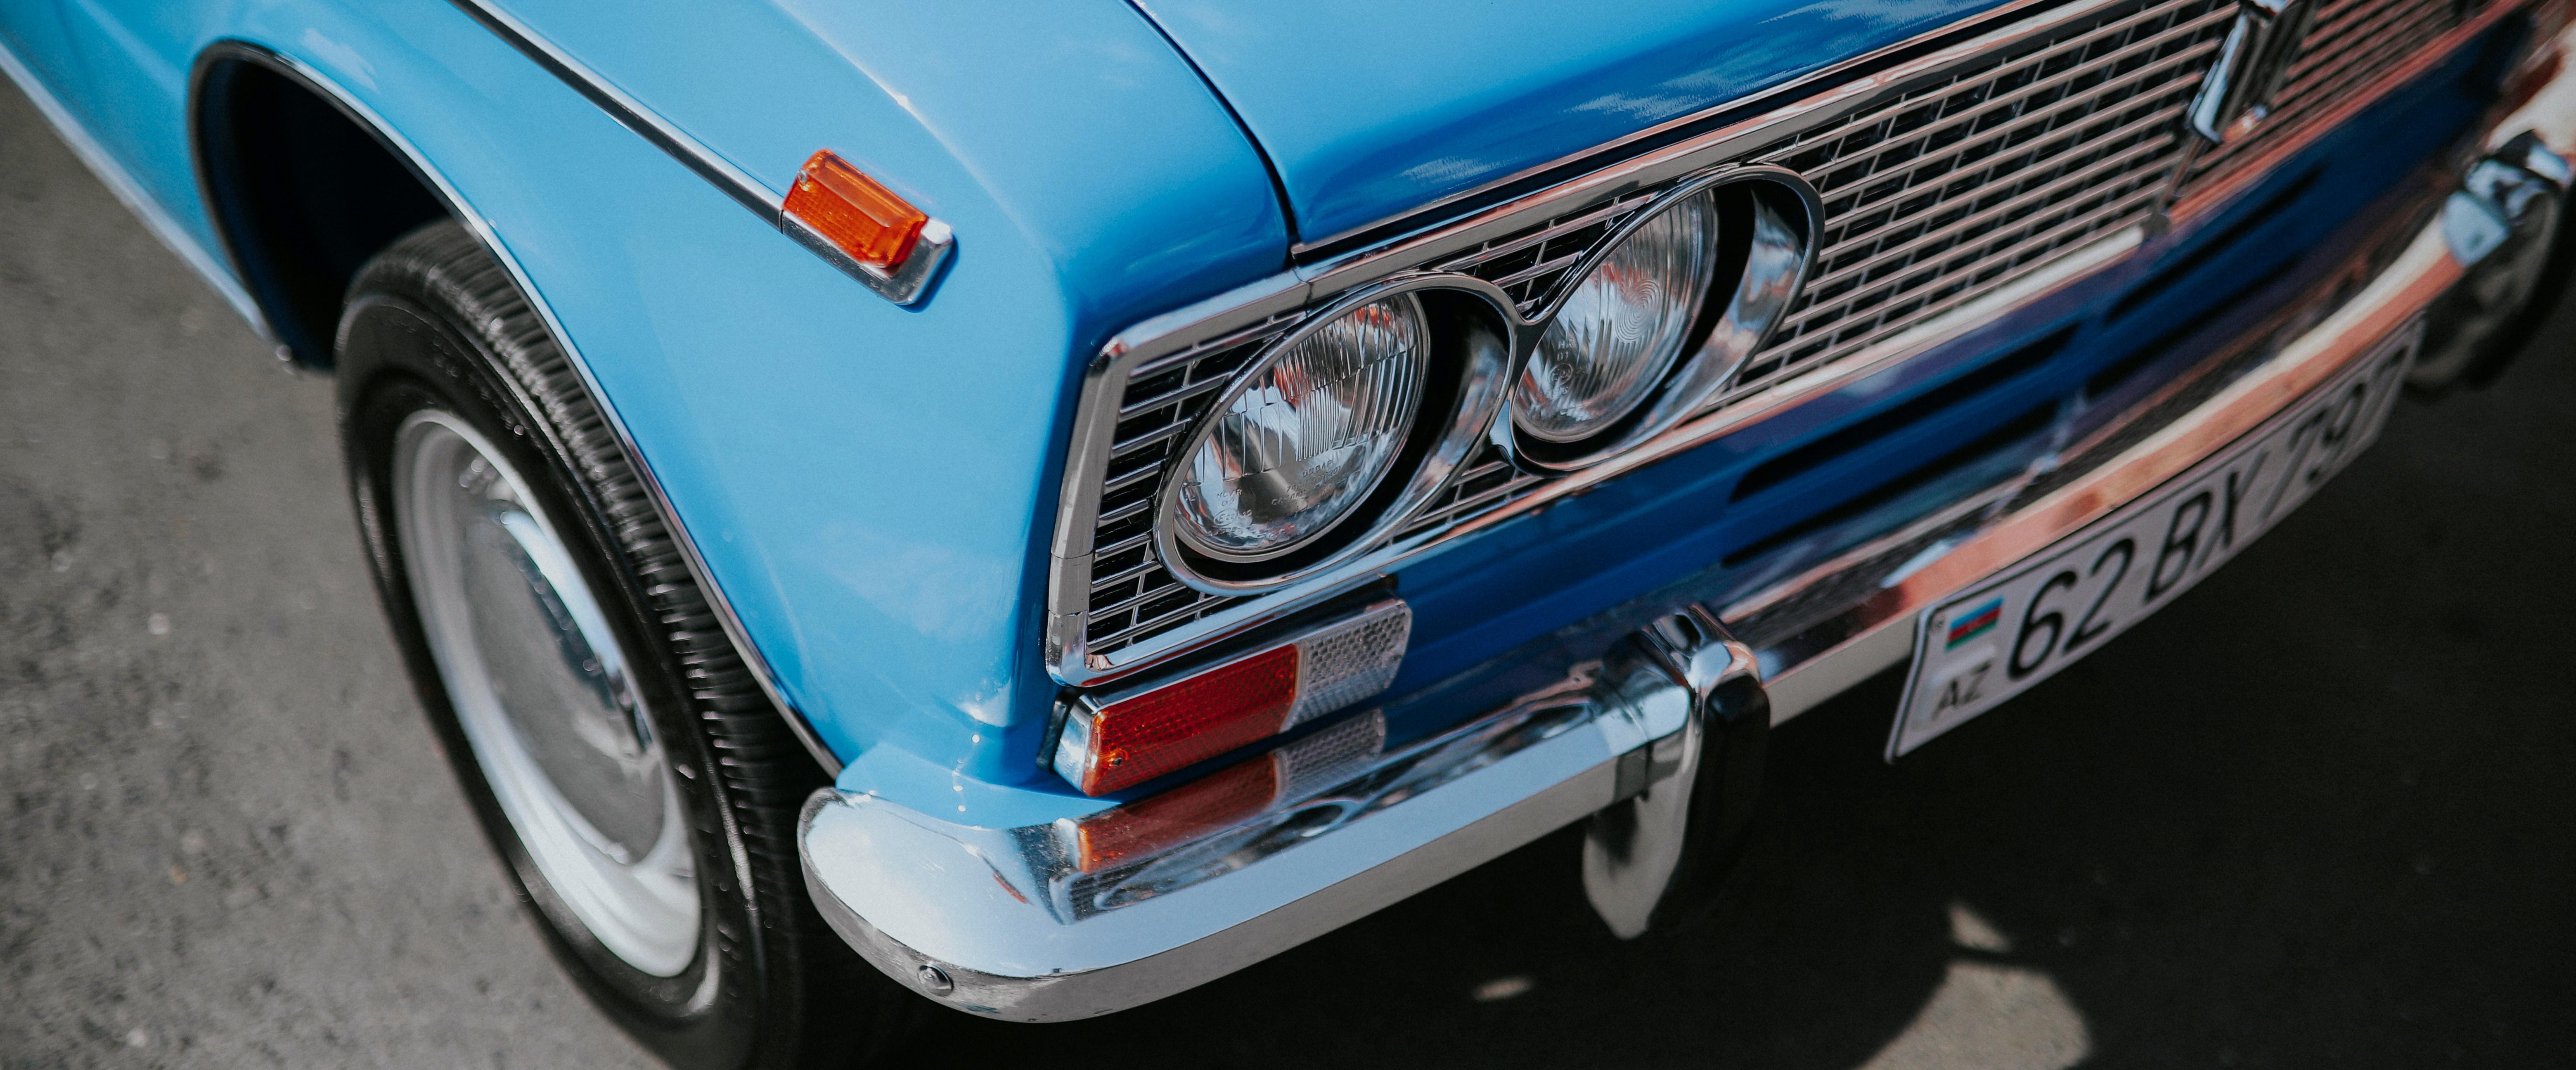 Fringe Benefit Tax Car